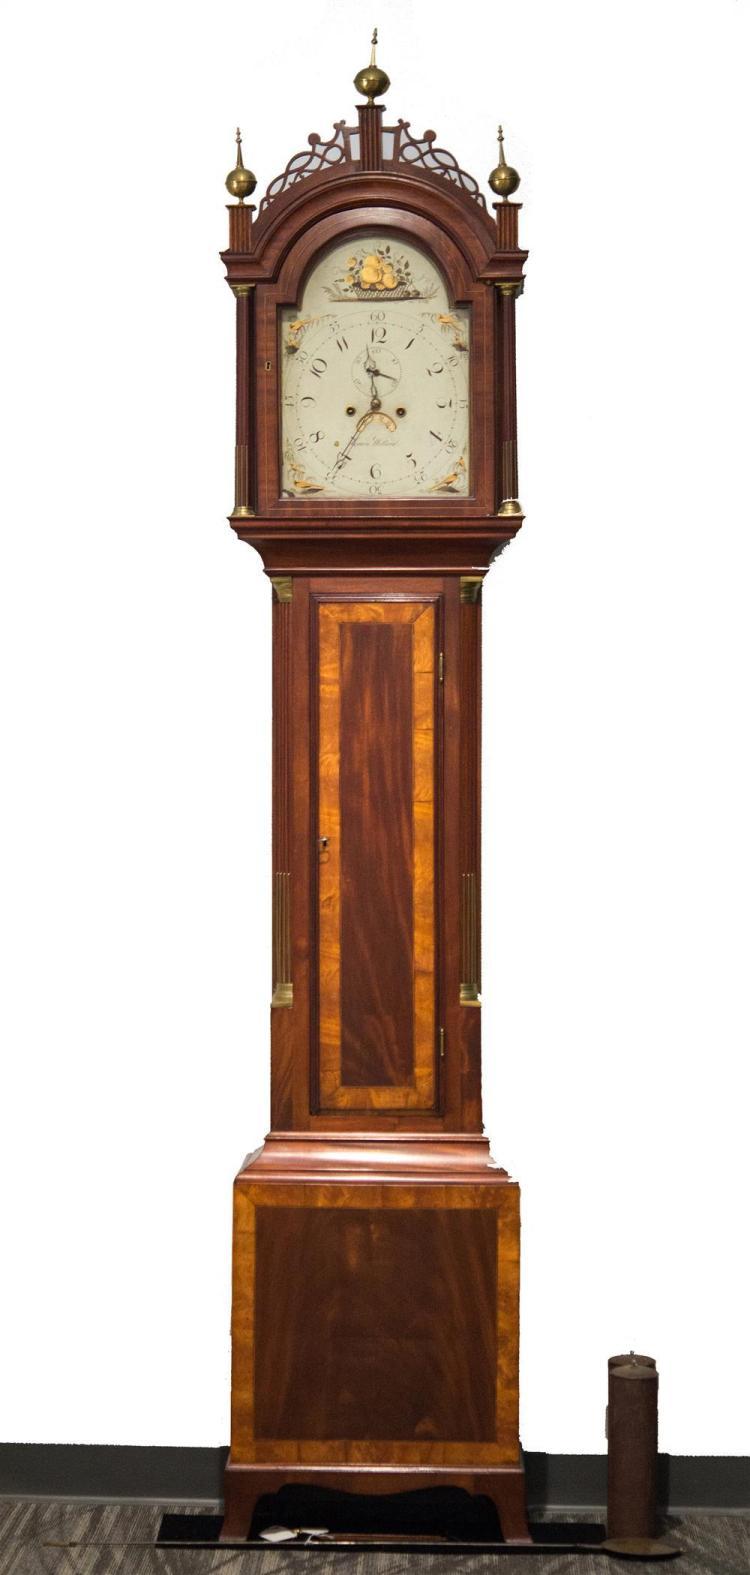 FEDERAL MAHOGANY INLAID TALL CASE CLOCK, Simon Willard